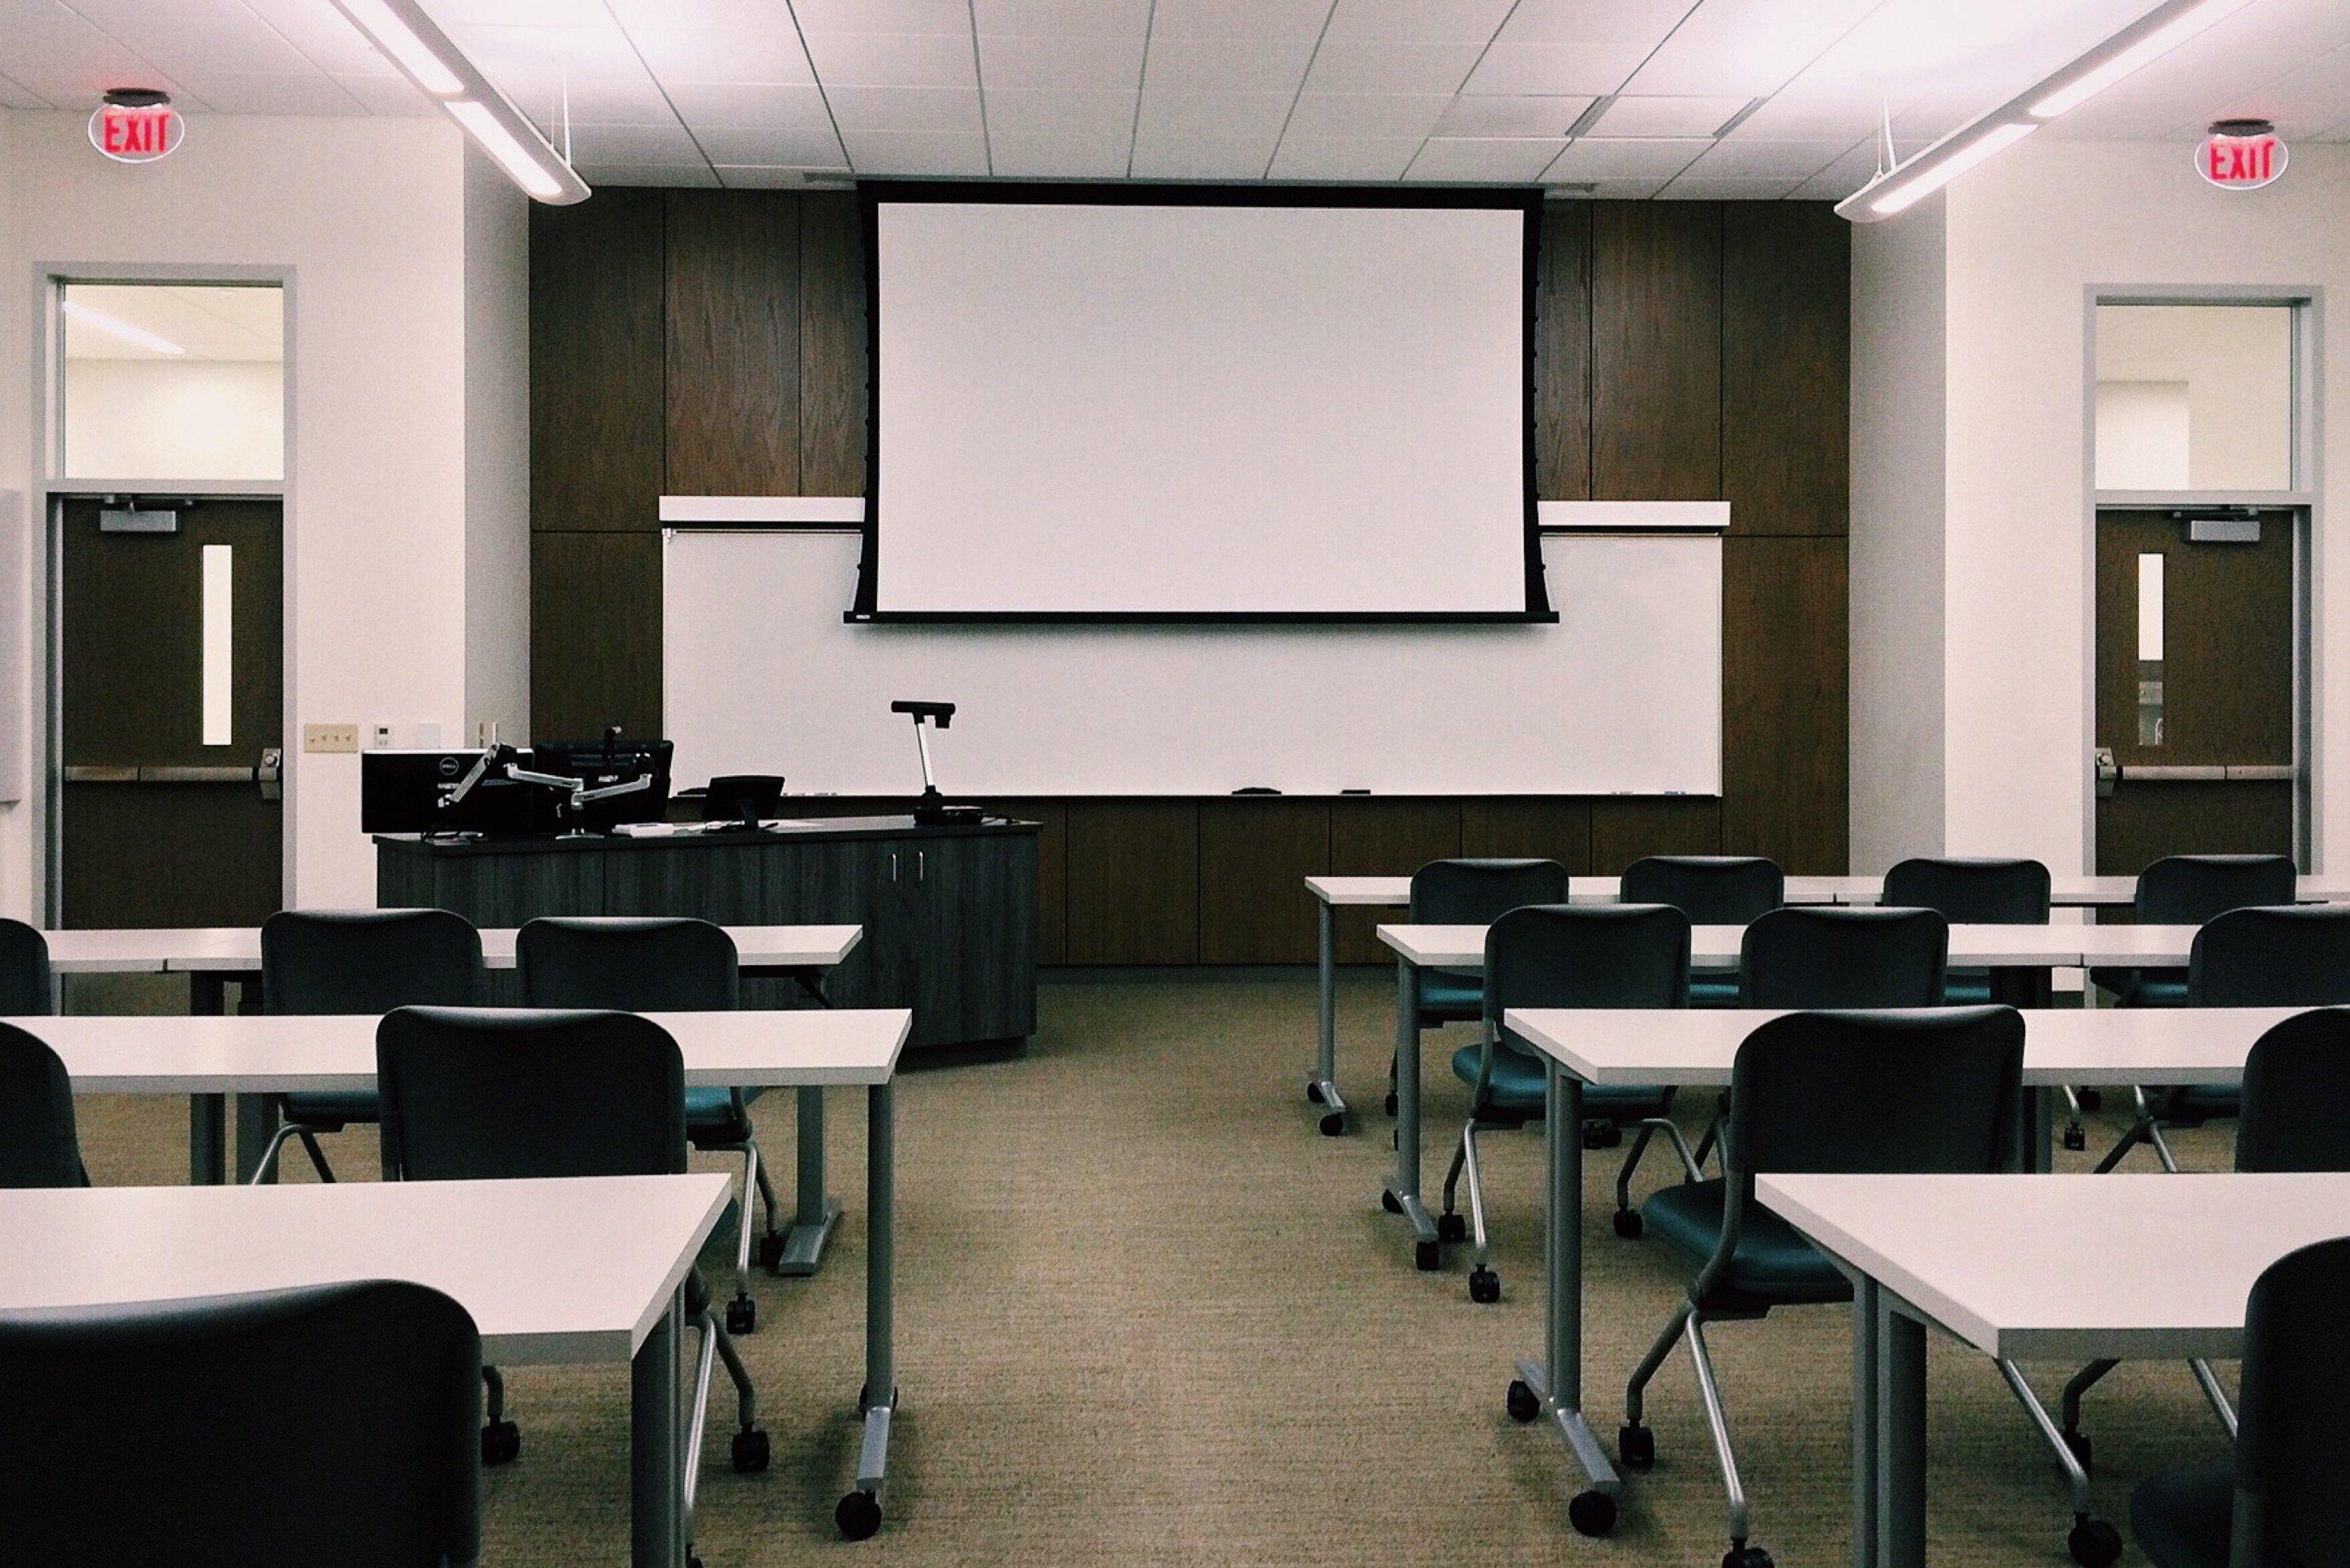 Canva - Empty Classroom with White Board